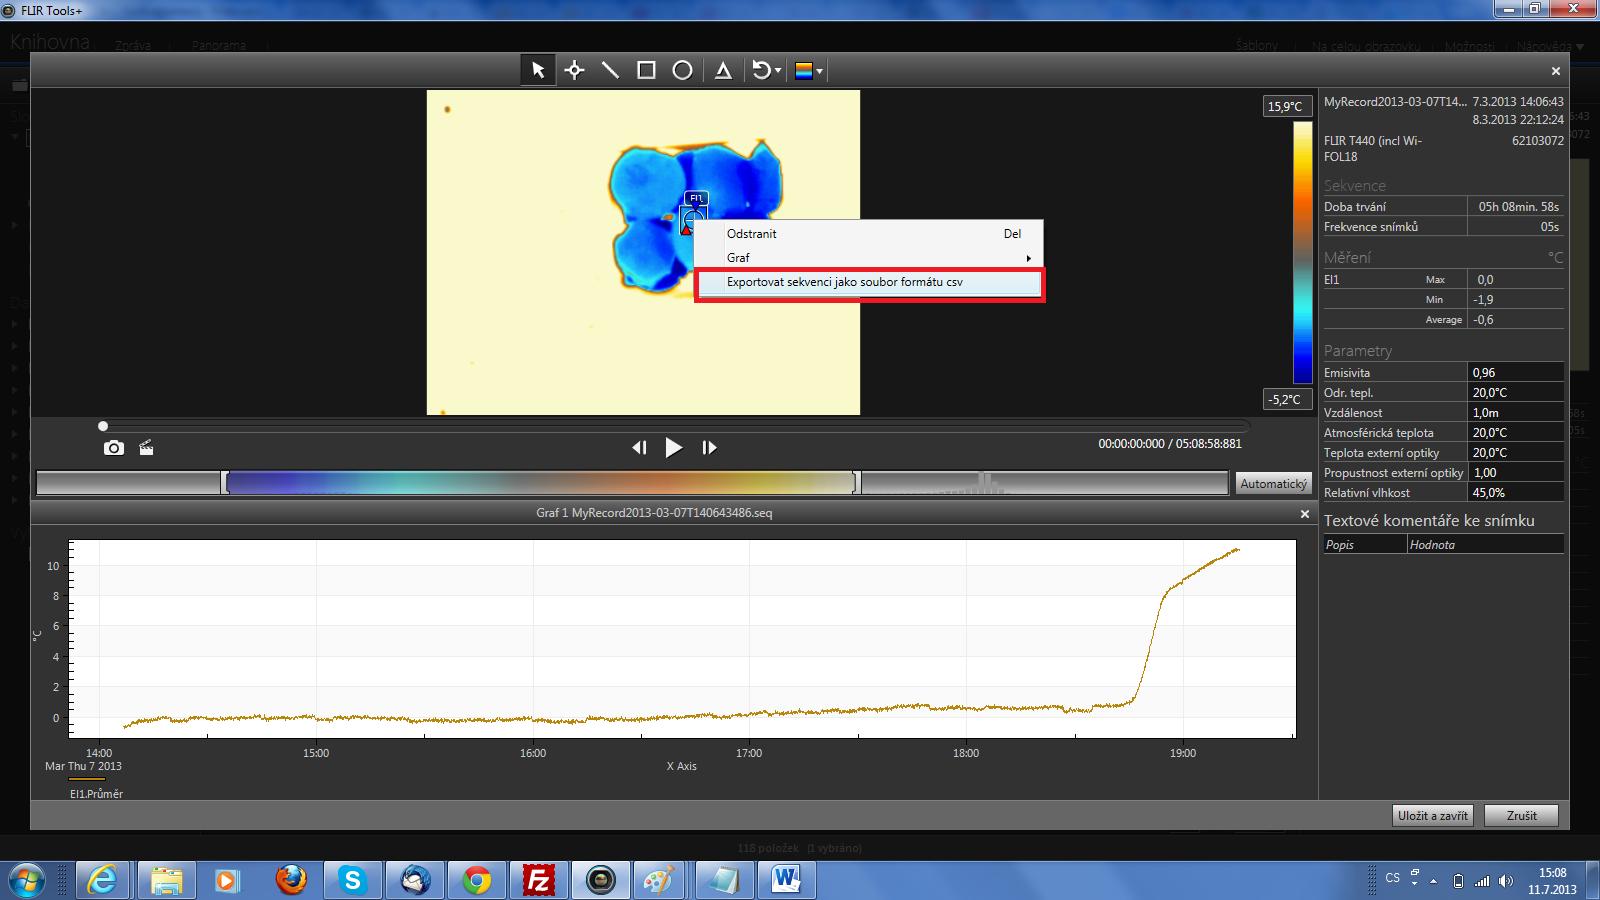 Export celé radiometrické sekvence naměřené termokamerou do Excelu pomocí SW FLIR TOOLS+